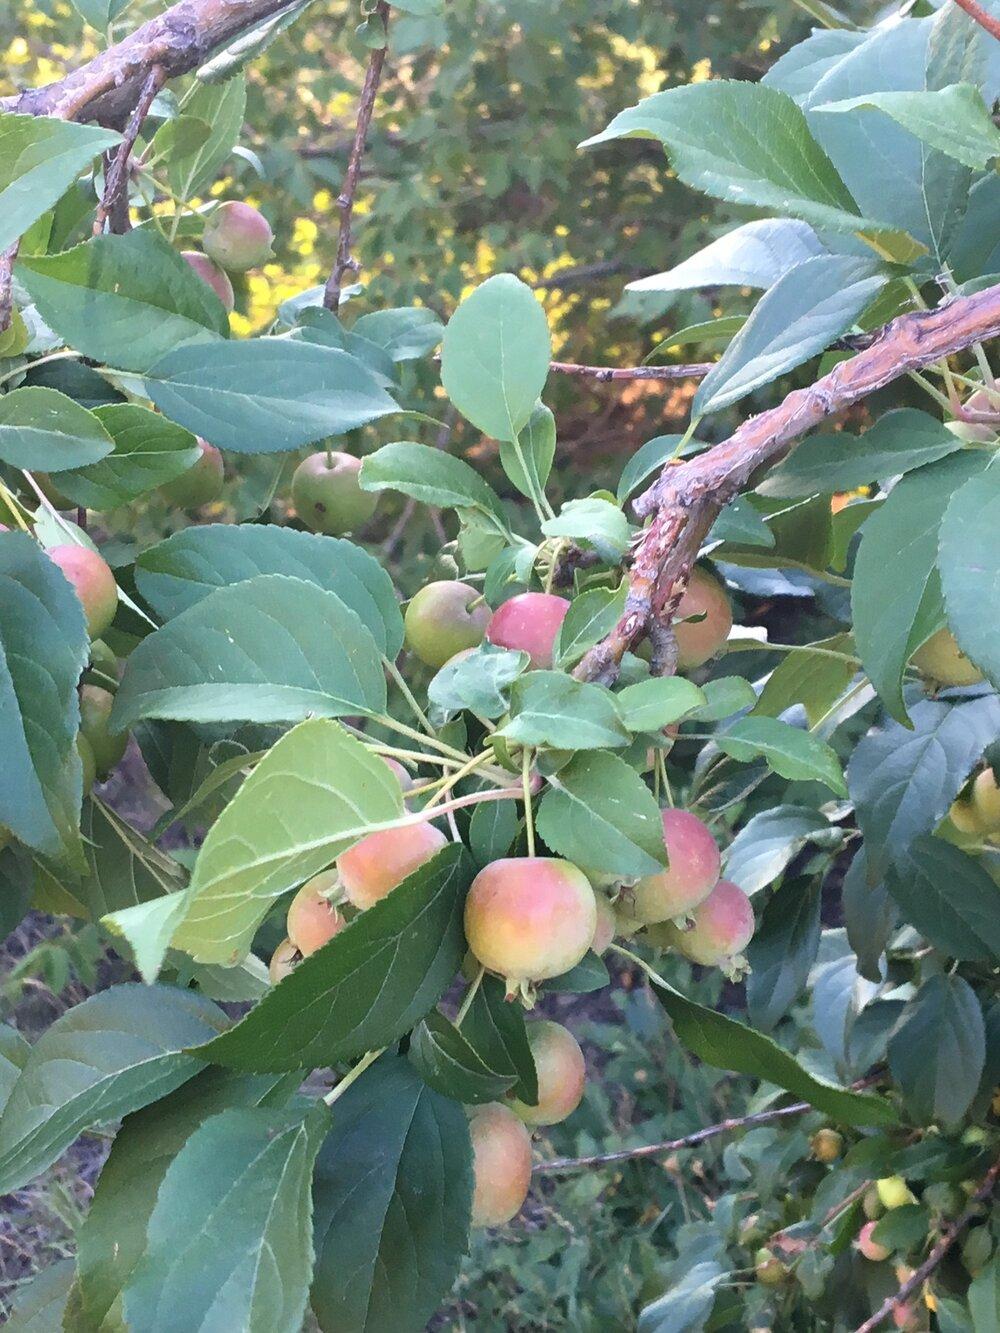 Crabapple tree visited during the AppleBlitz 2018